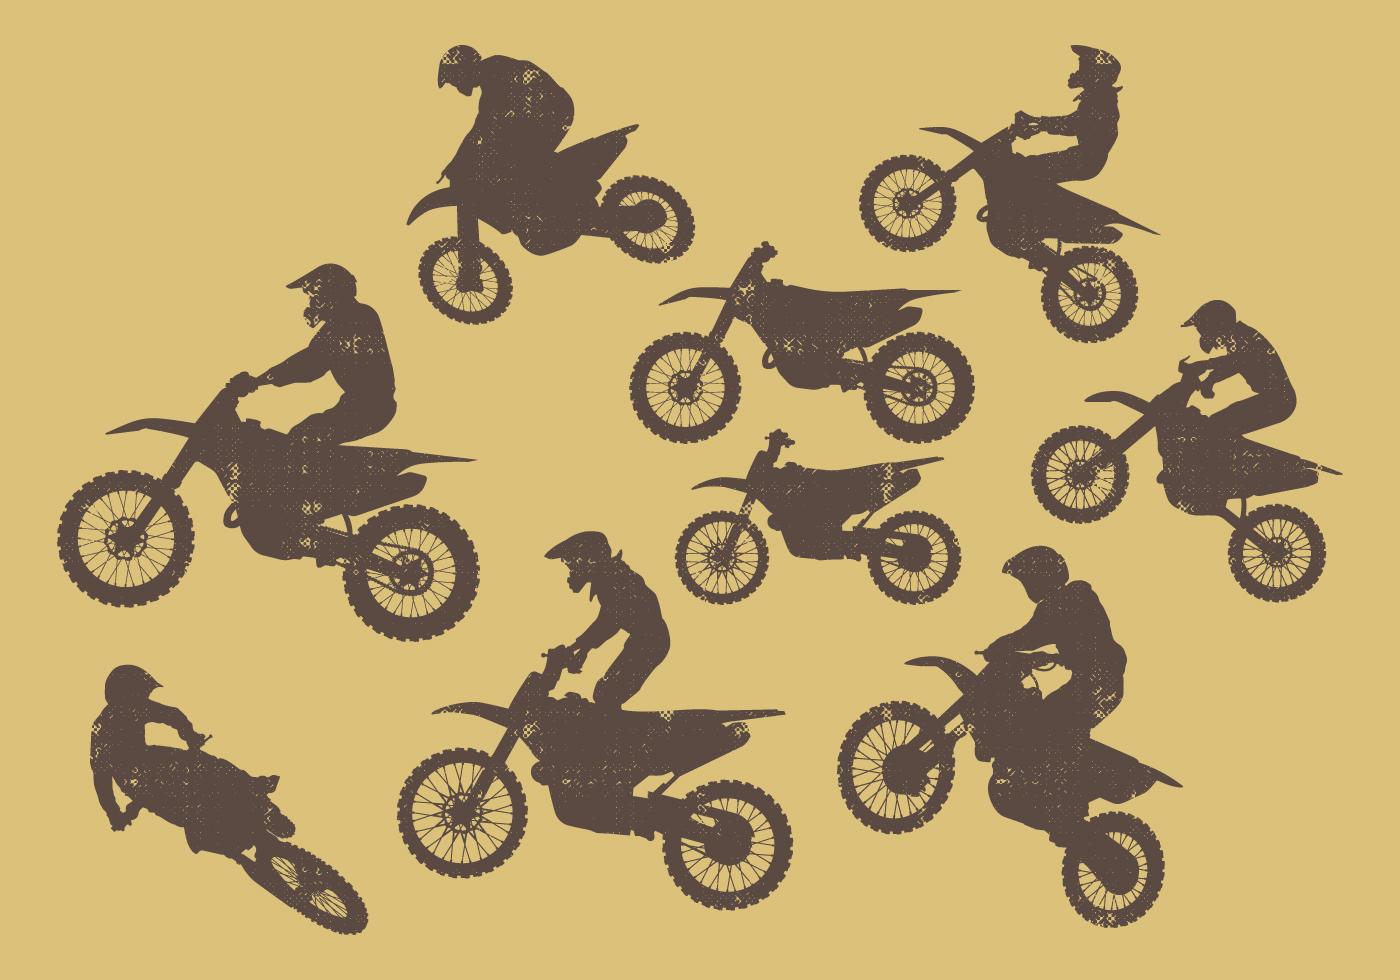 Dirt Bikes Silhouette - Download Free Vector Art, Stock Graphics ...